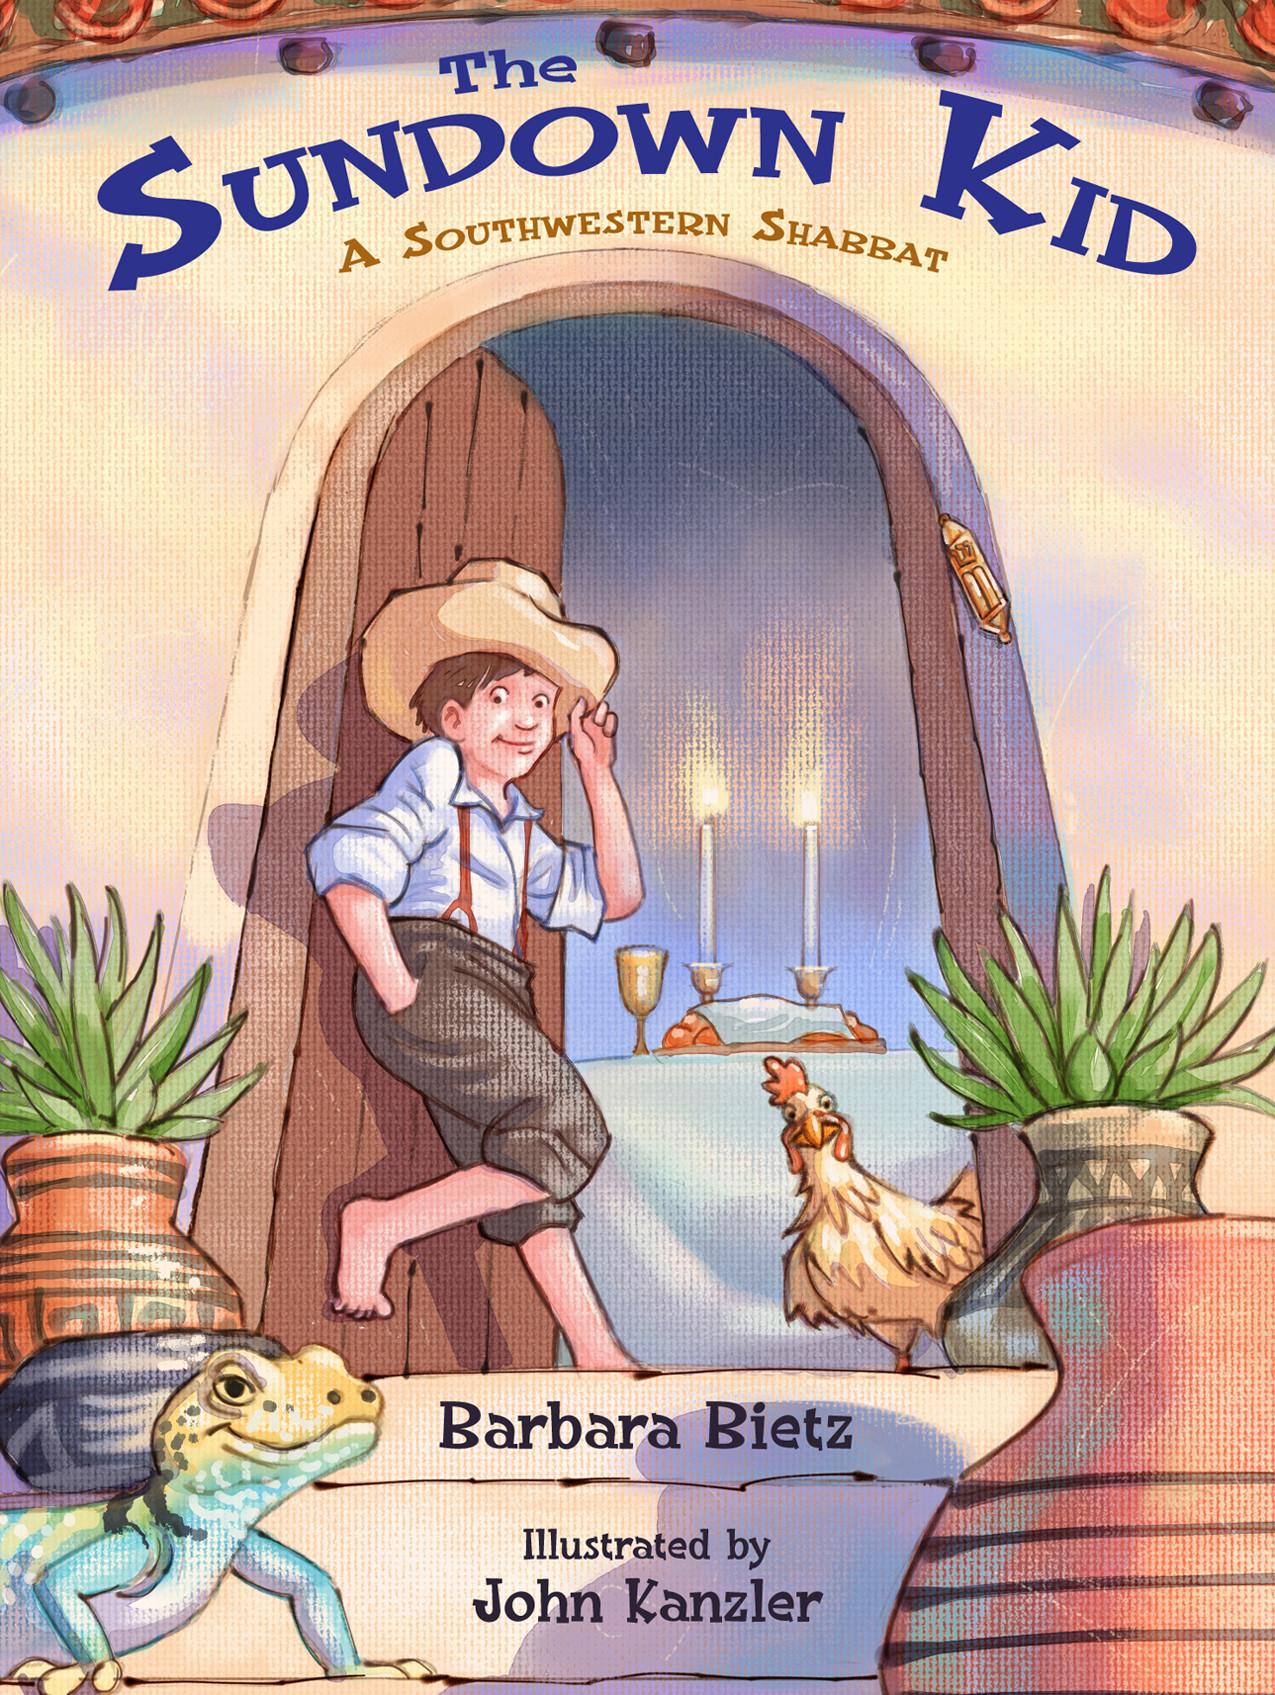 The Sundown Kid by Barbara Bietz